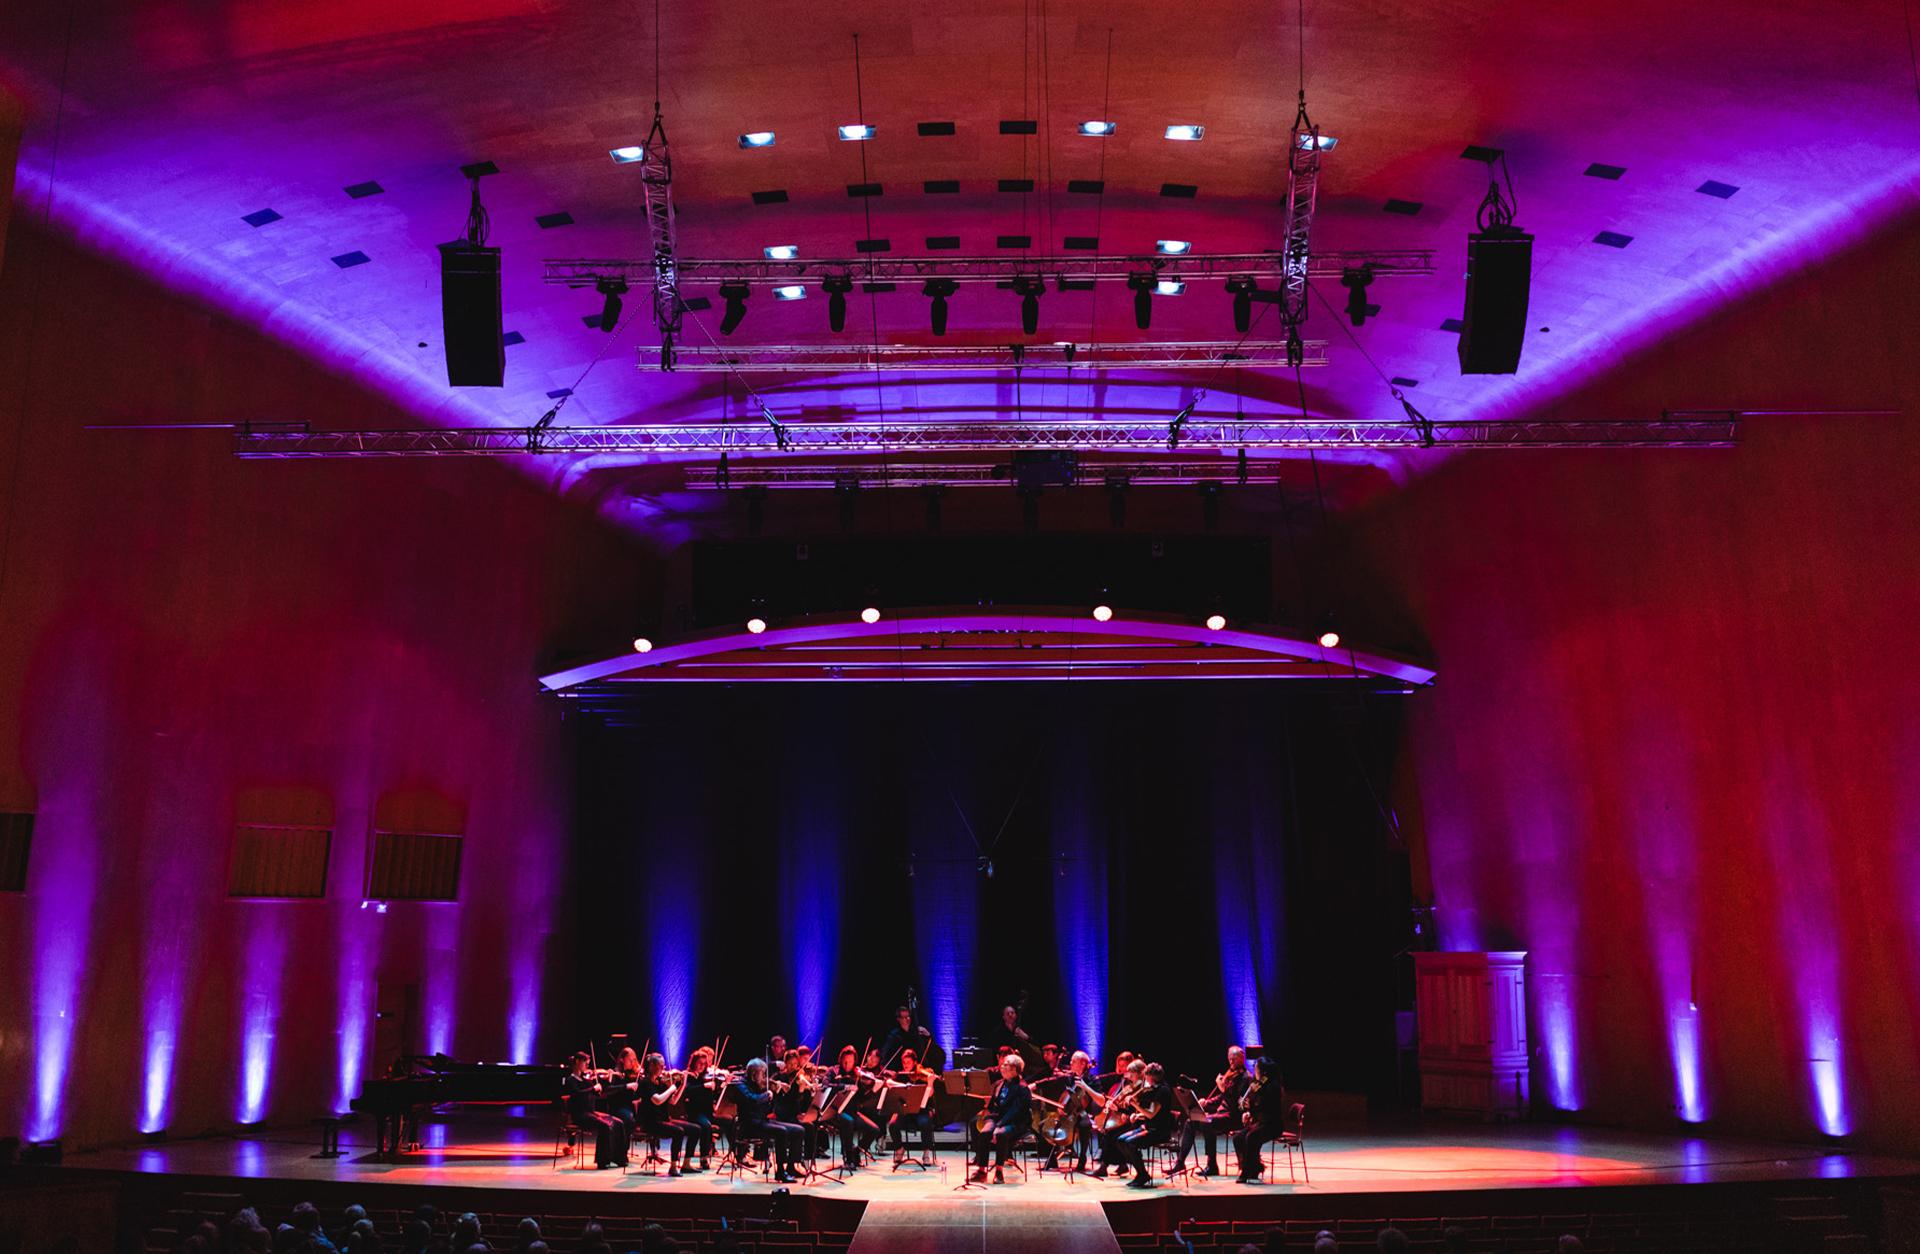 Konsert i stora salen